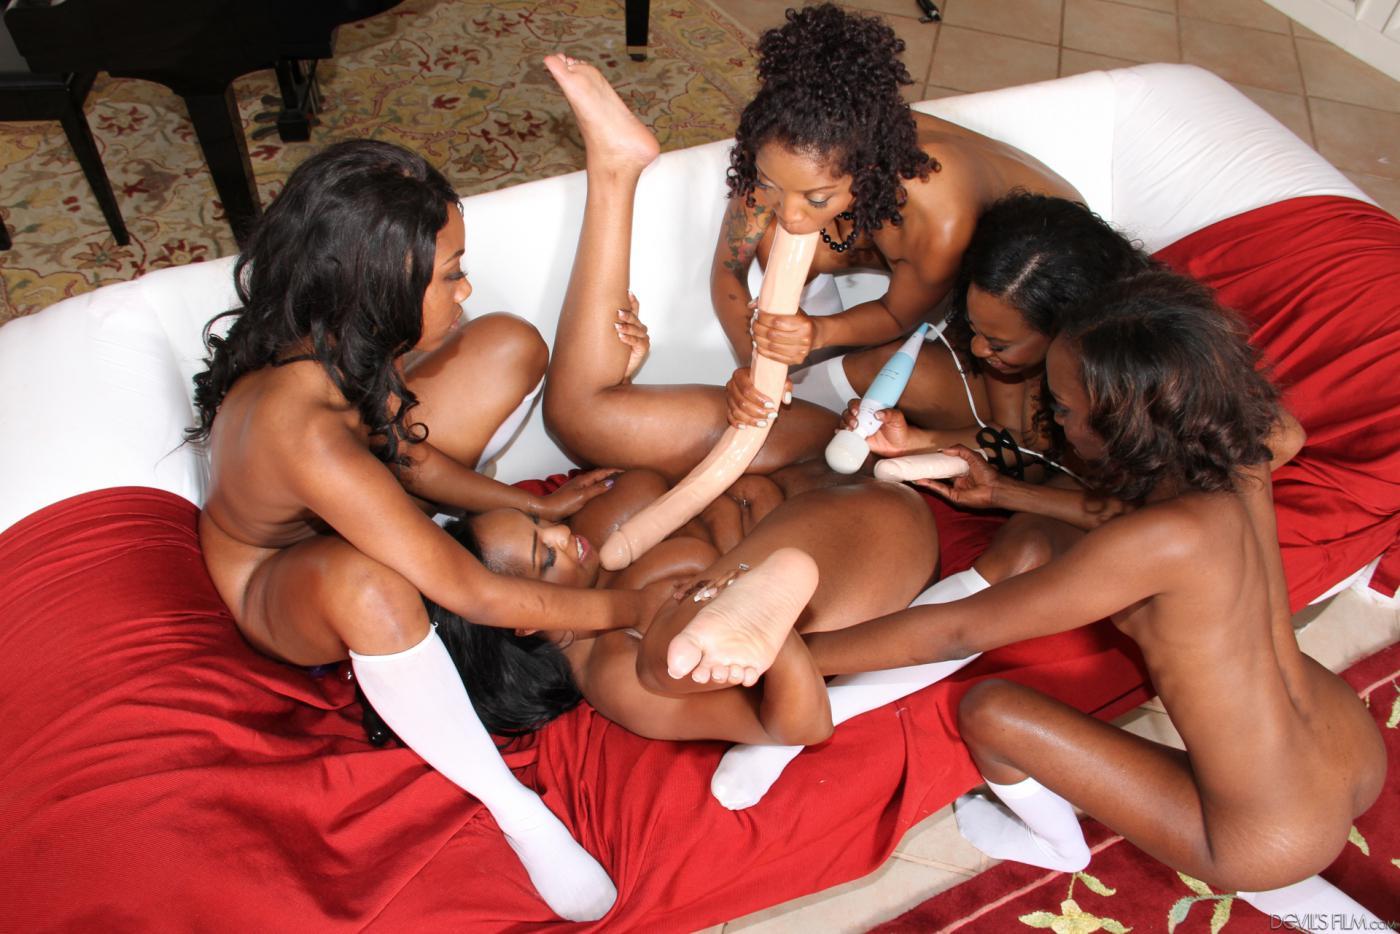 girls-and-black-lesbians-pornography